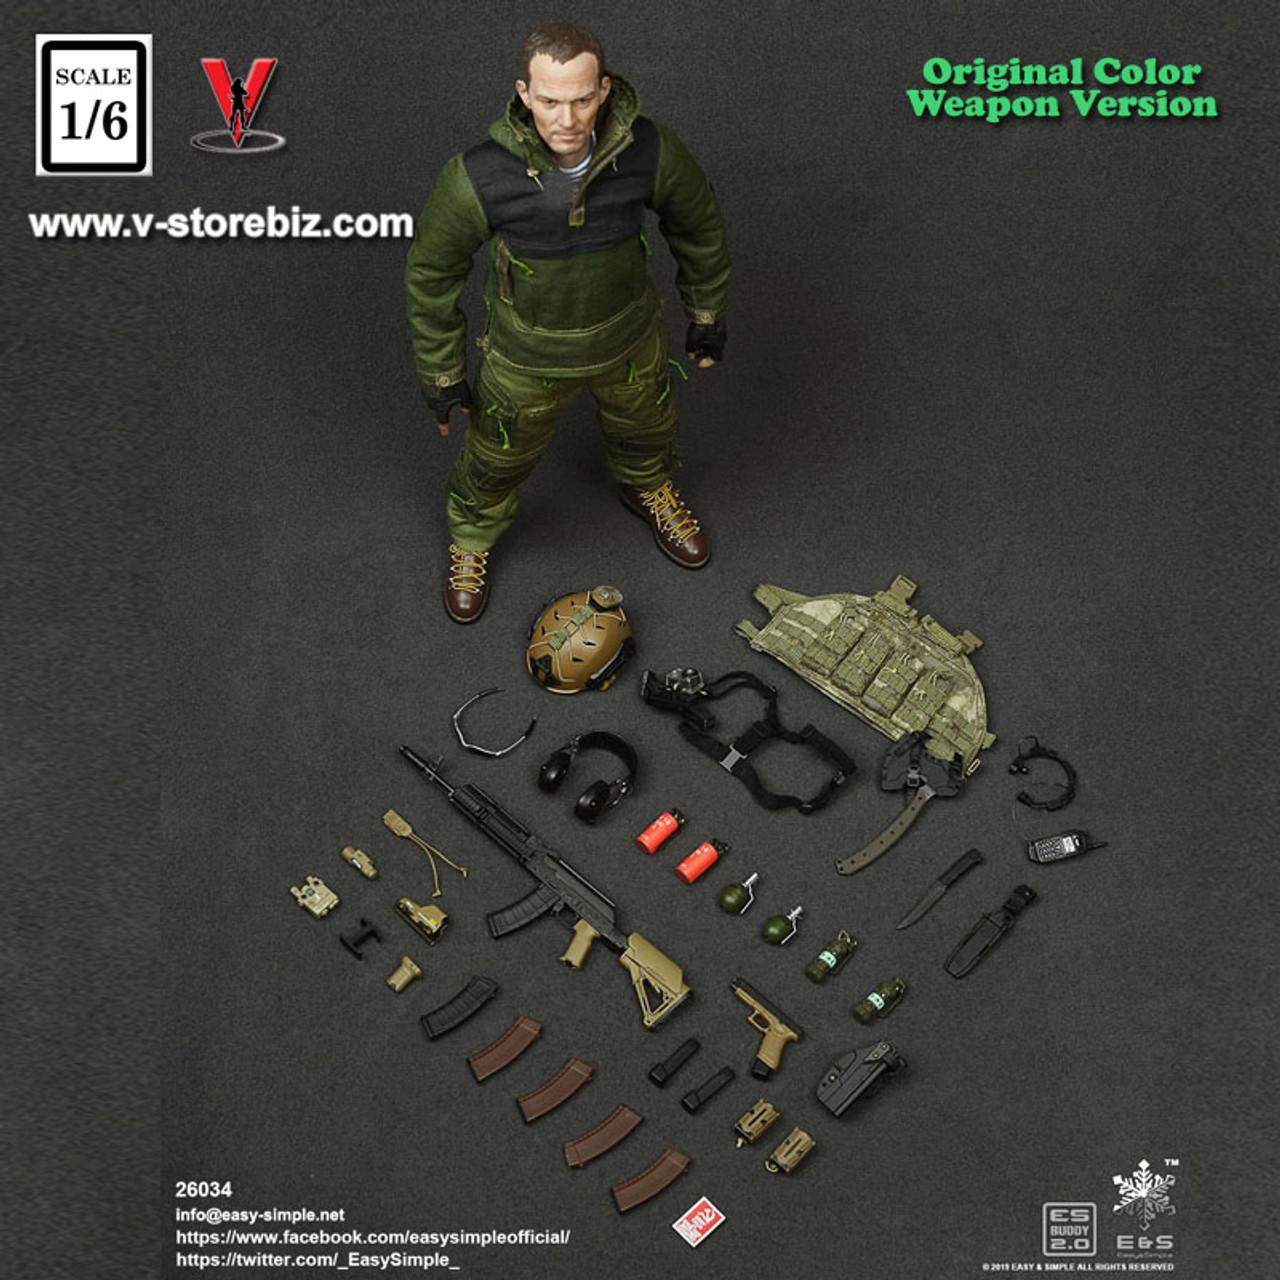 Y97-59 1//6 scale ES 26035S SCO19 CTSFO G3 Custom Combat Uniform